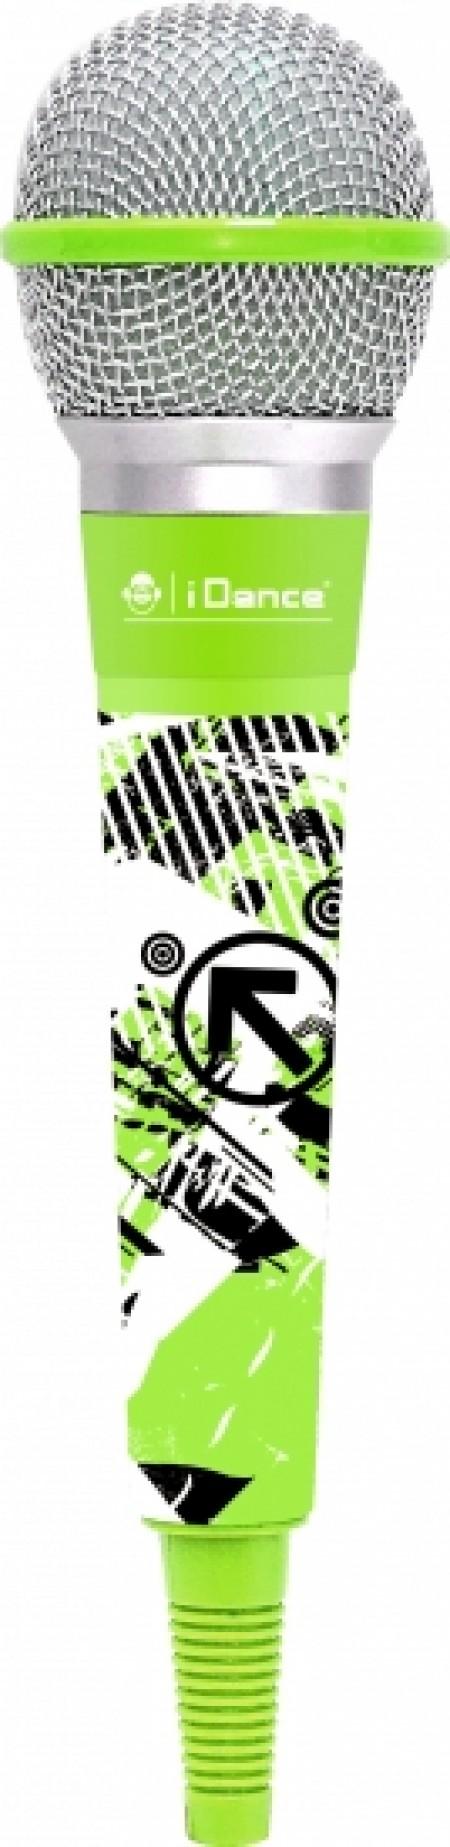 iDance Microphone CLM1 Green ( 028829 )